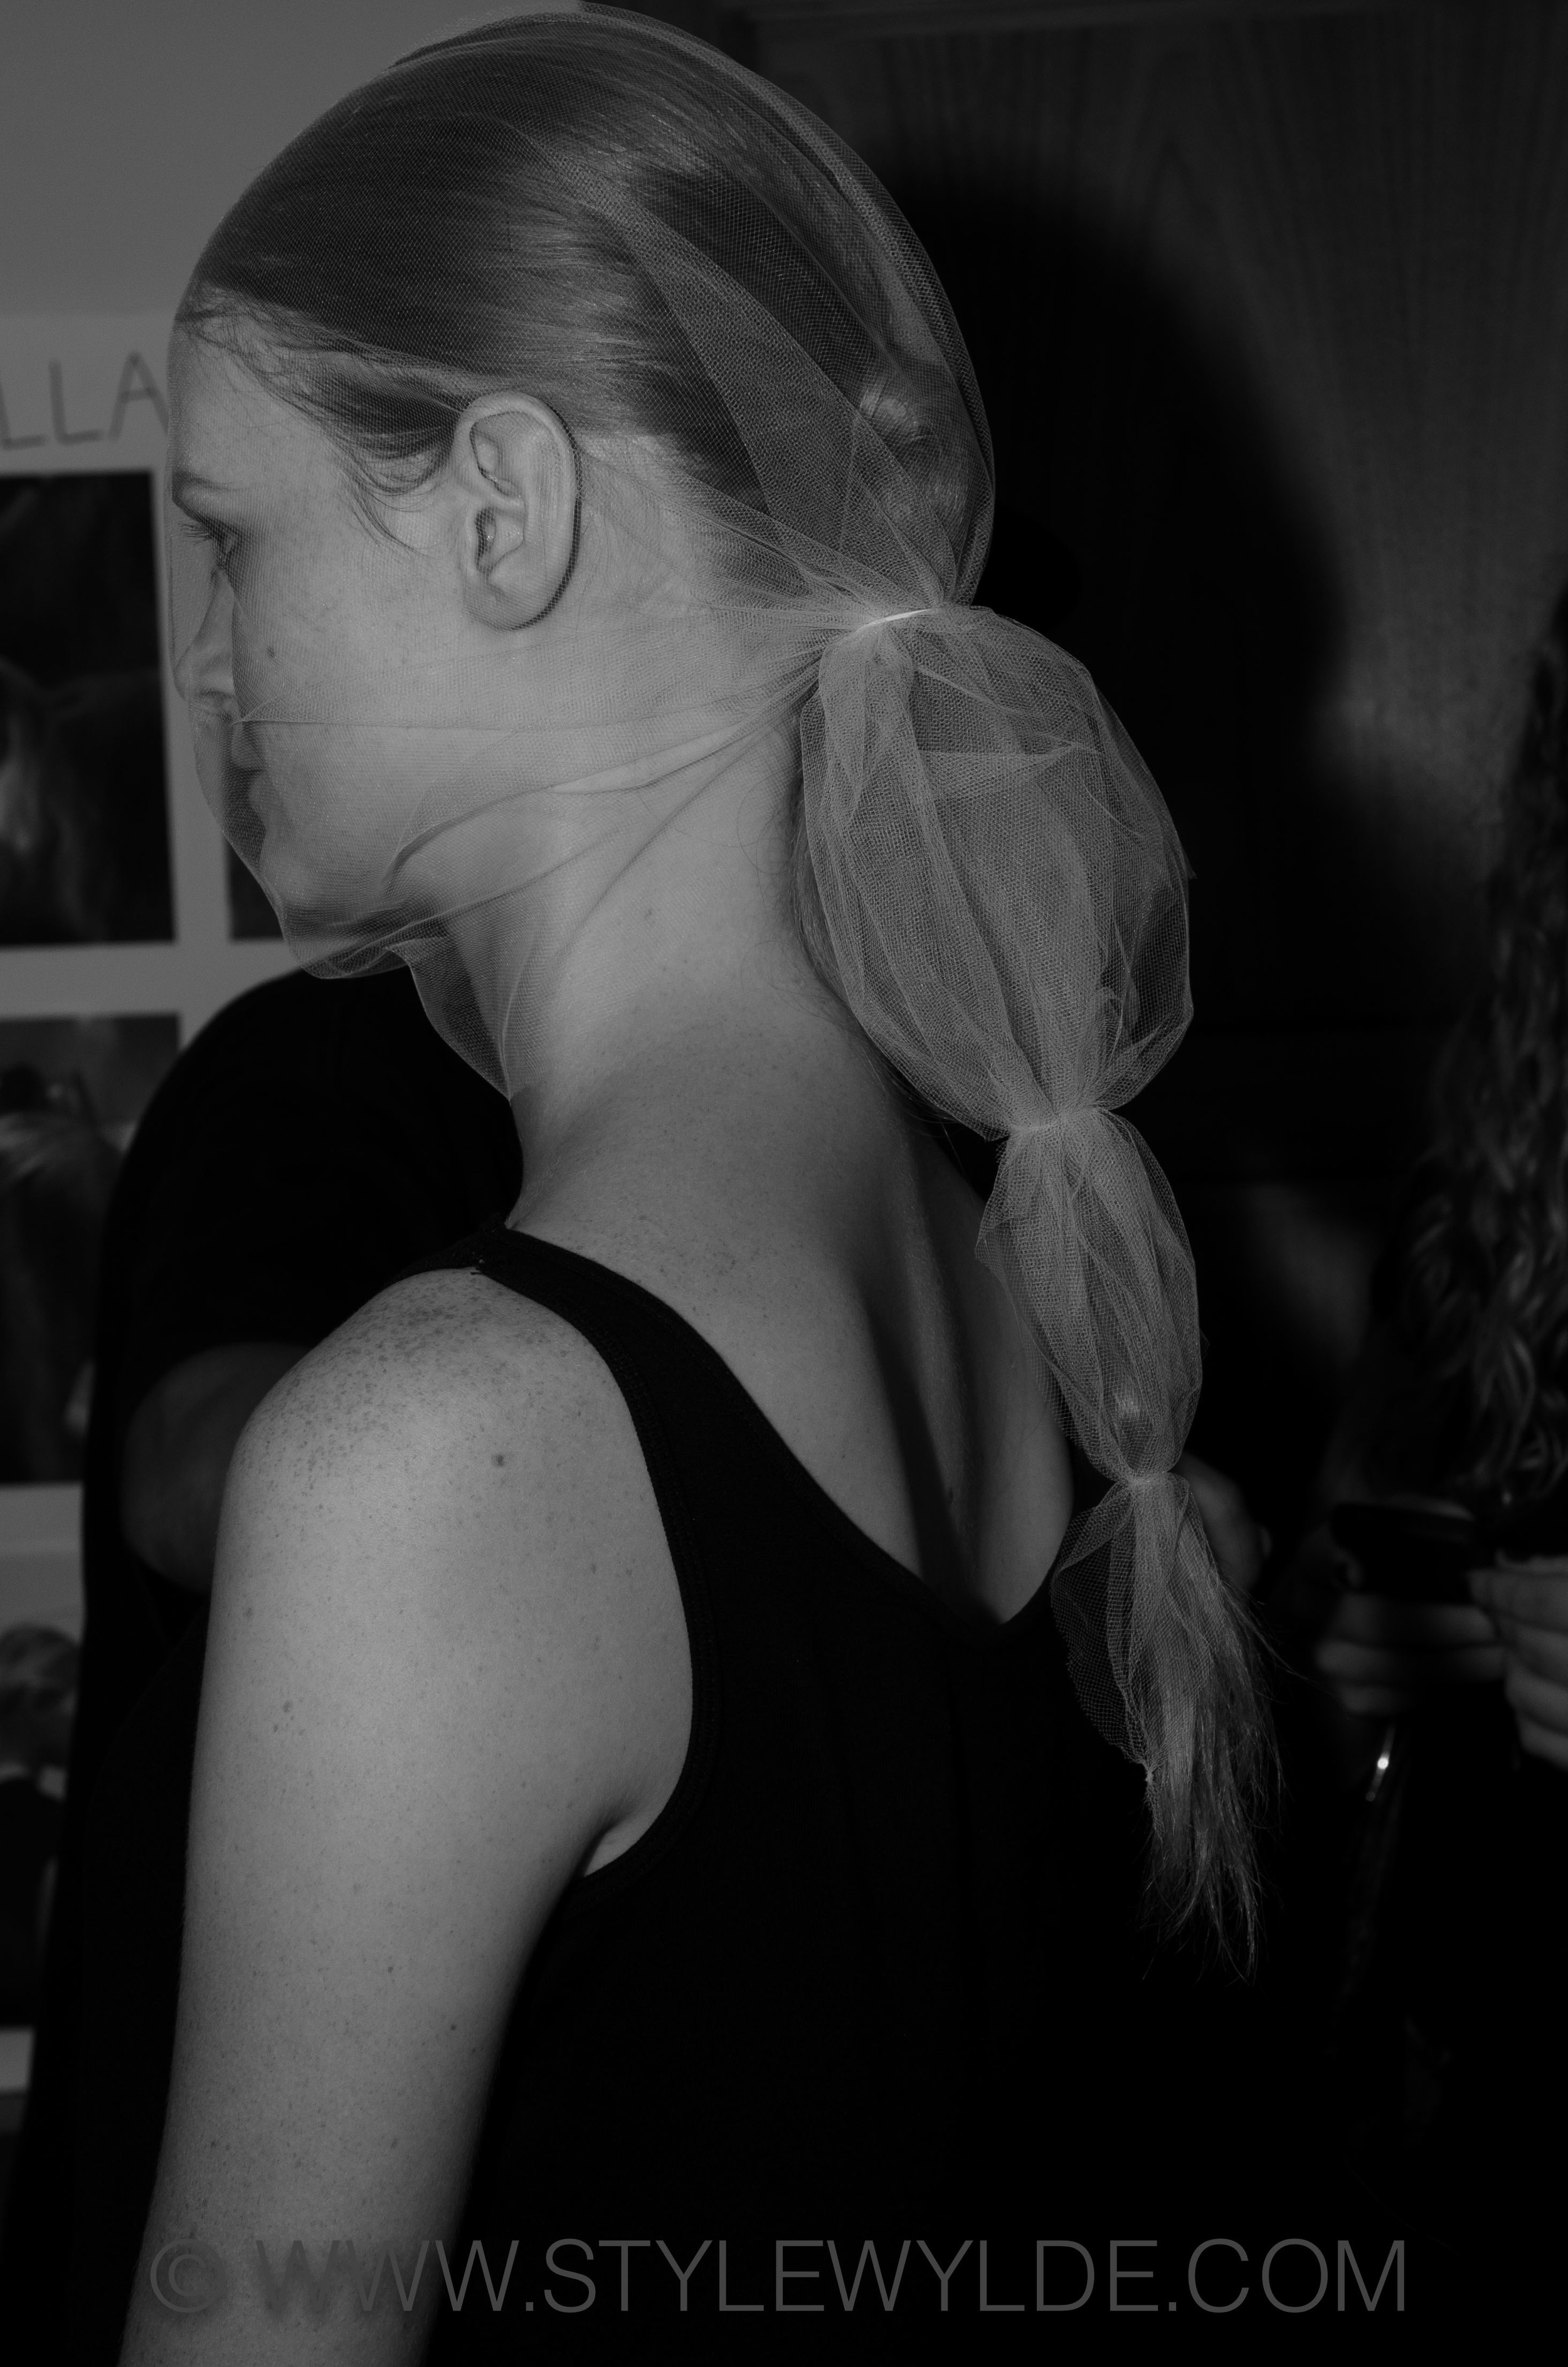 StyleWylde_KatieG_BKSTG_SS15 (16 of 22).jpg